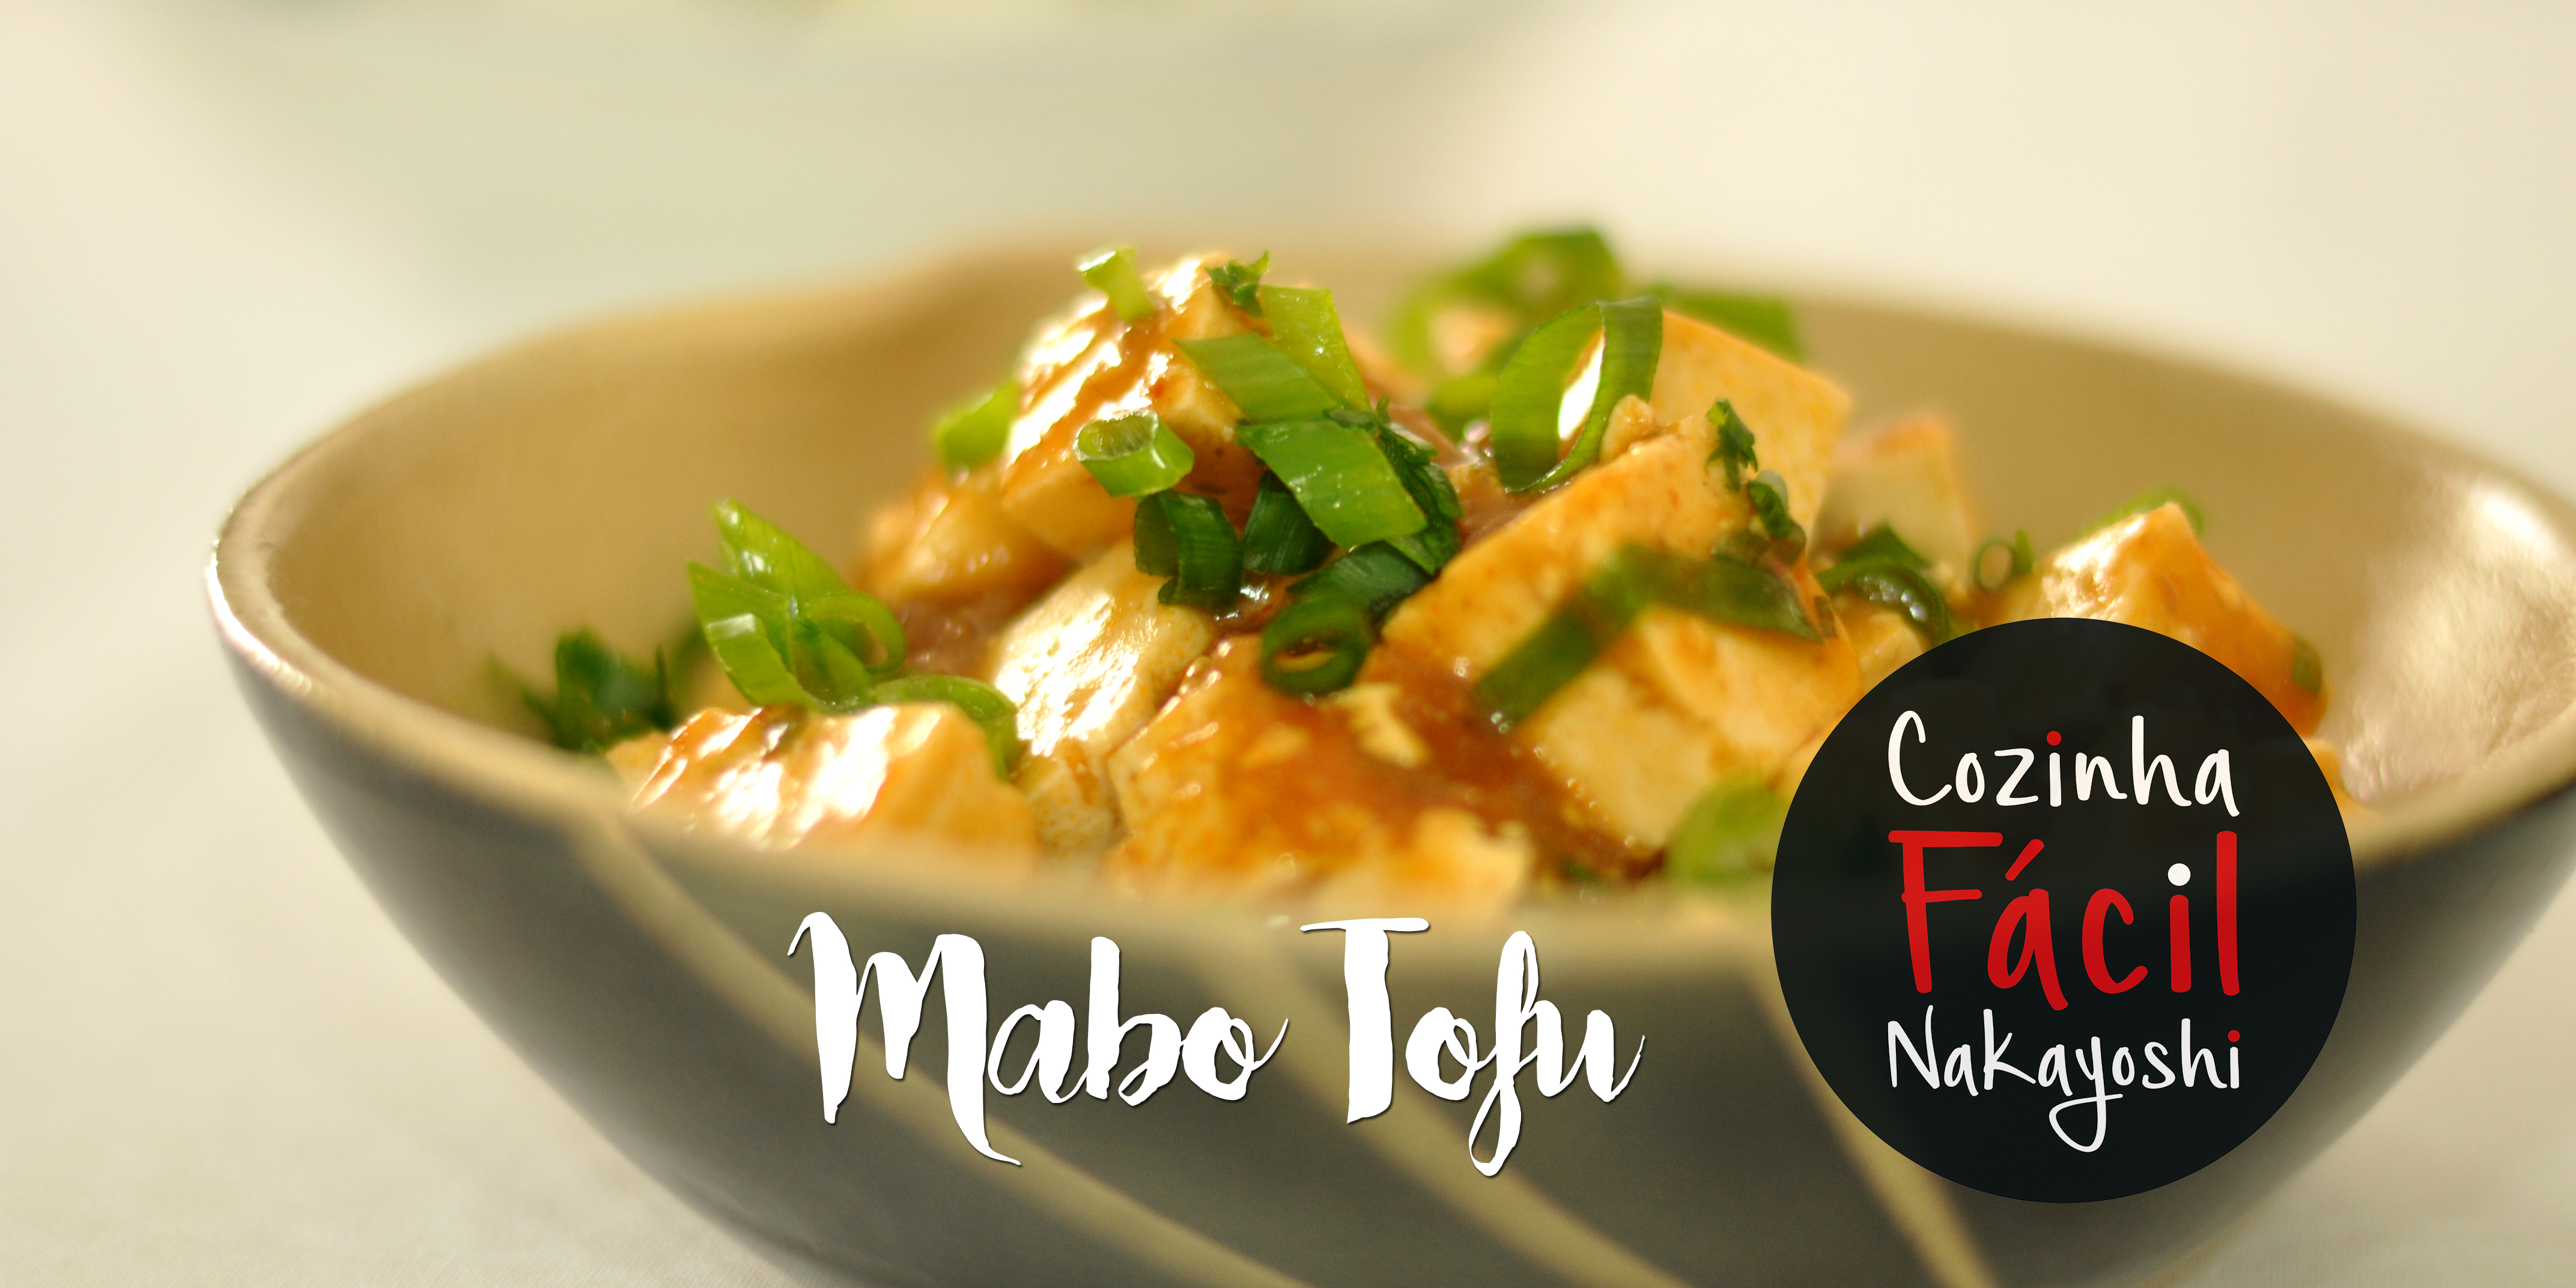 Mabo Tofu | Cozinha Fácil Nakayoshi #4